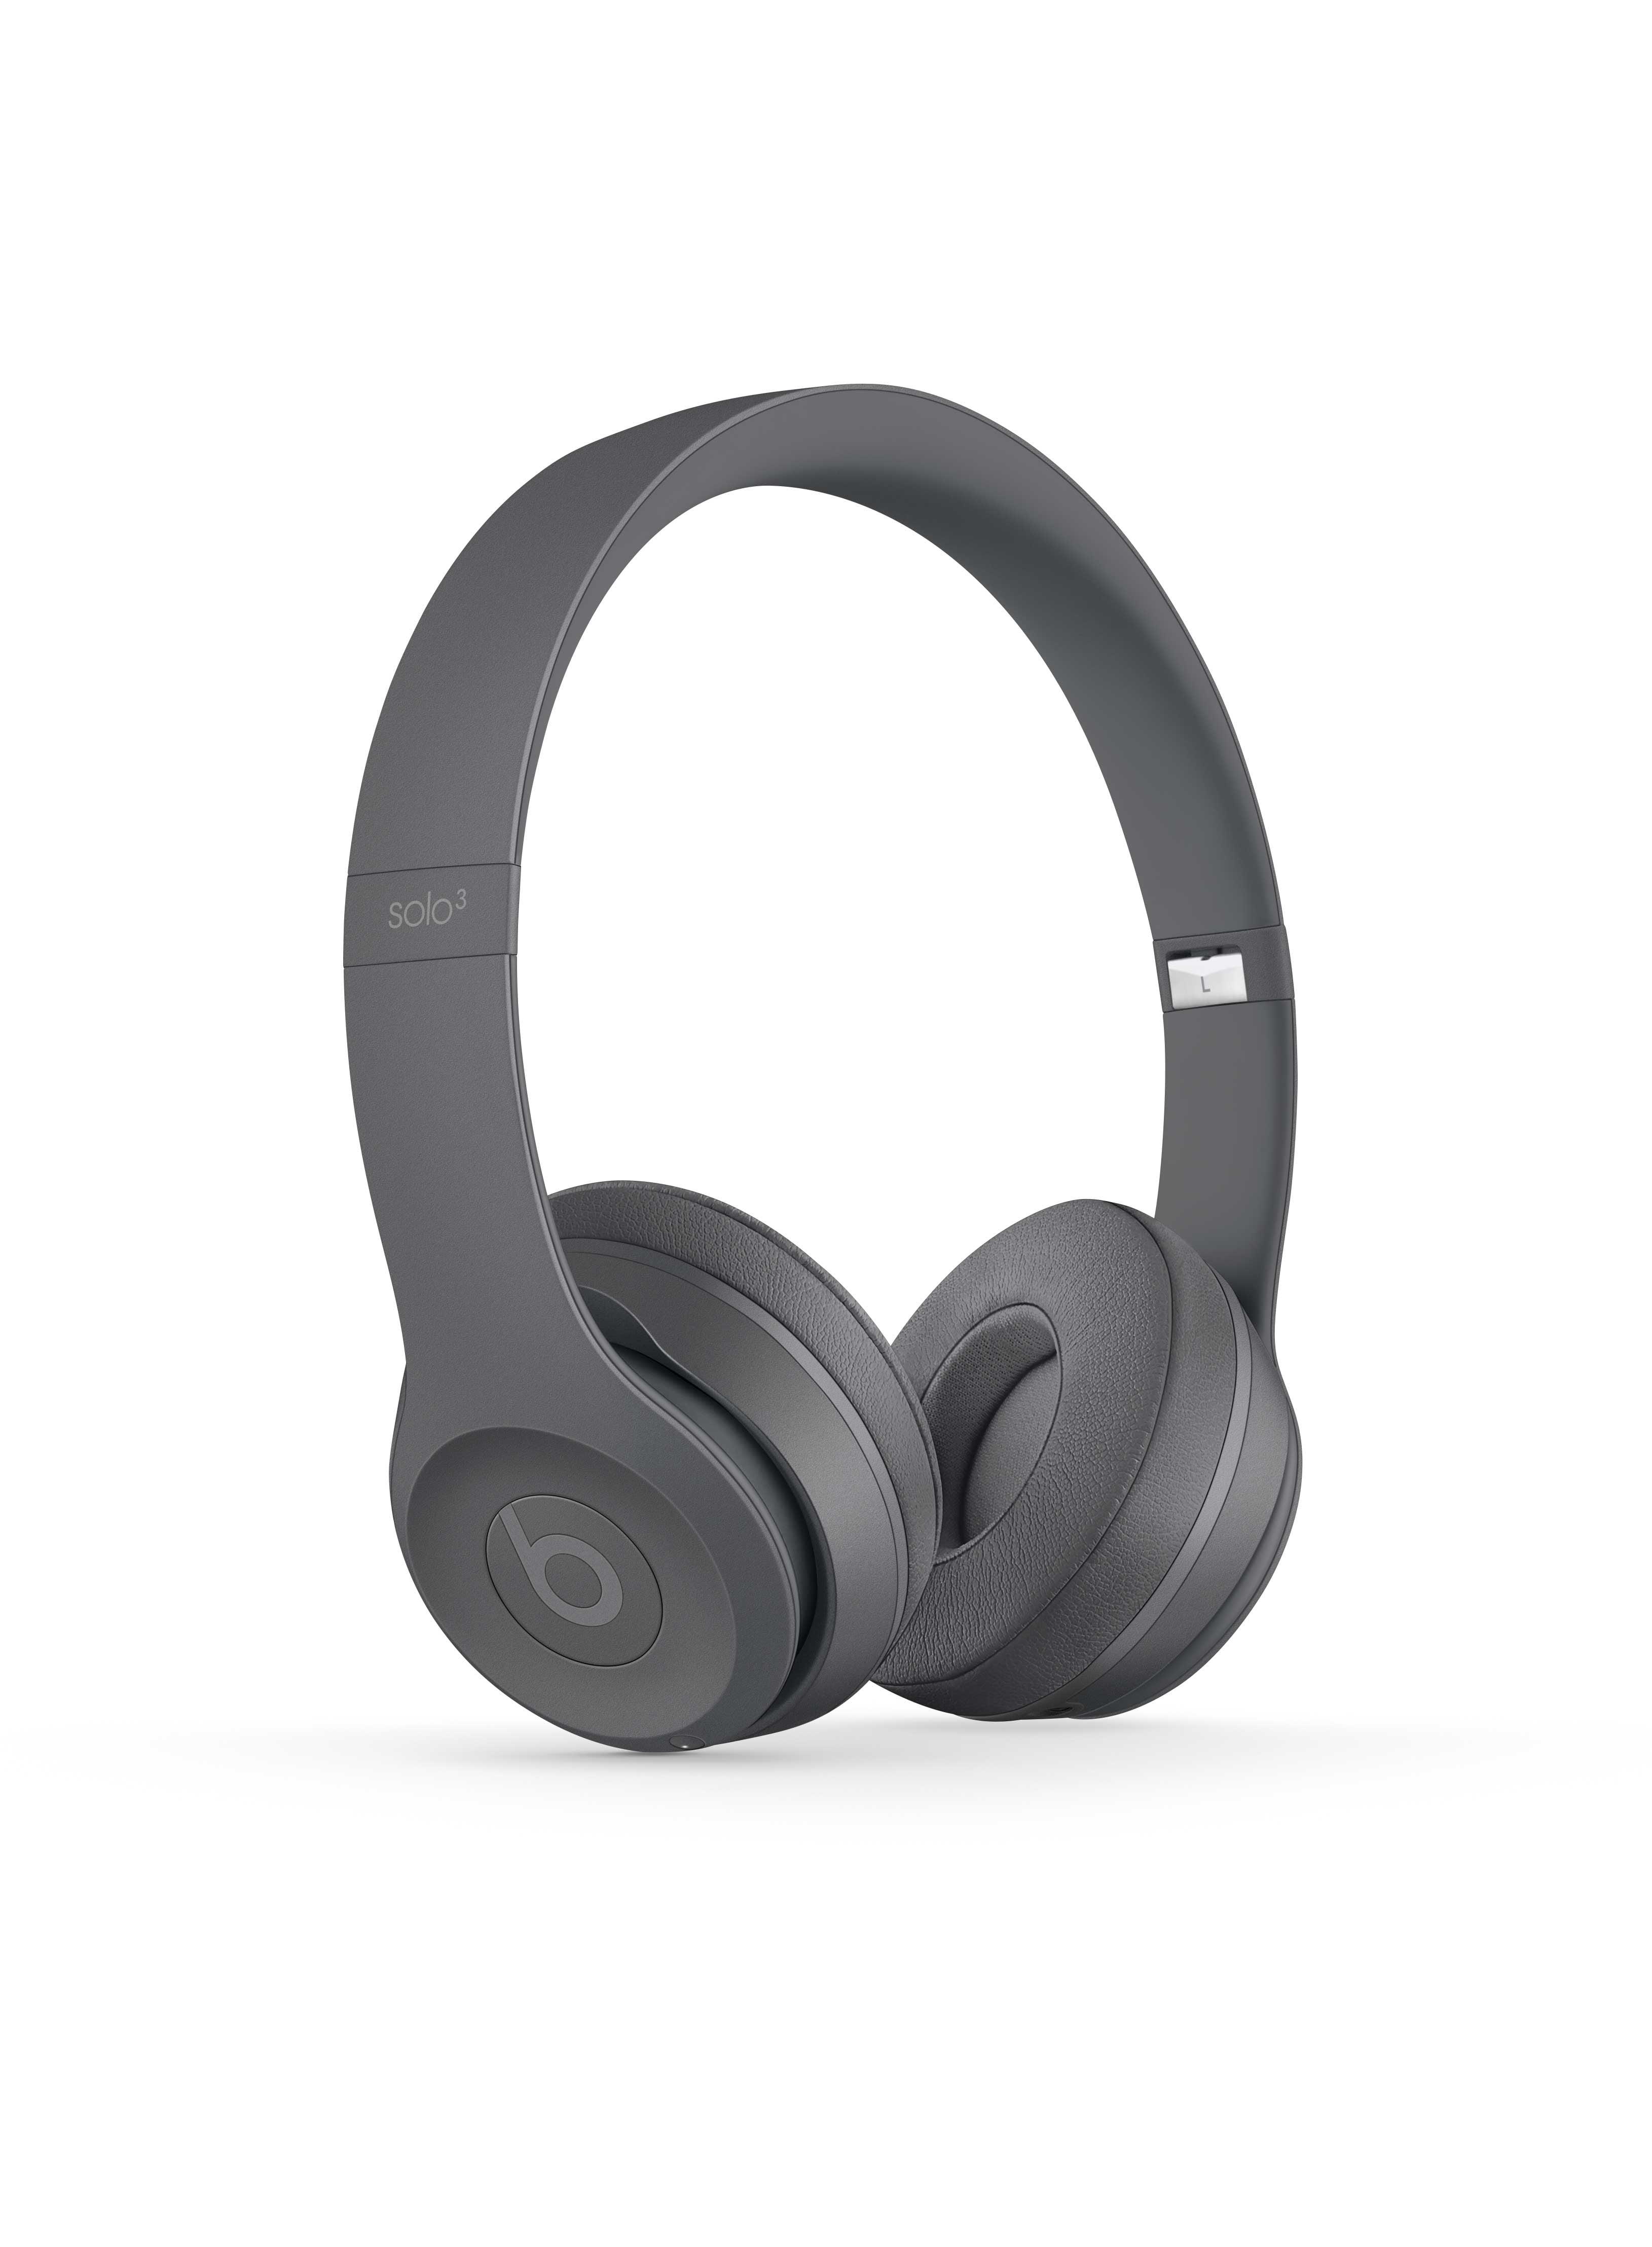 e7c73adae0f Beats Solo3 Wireless On-Ear Headphones - Neighborhood Collection -  Walmart.com